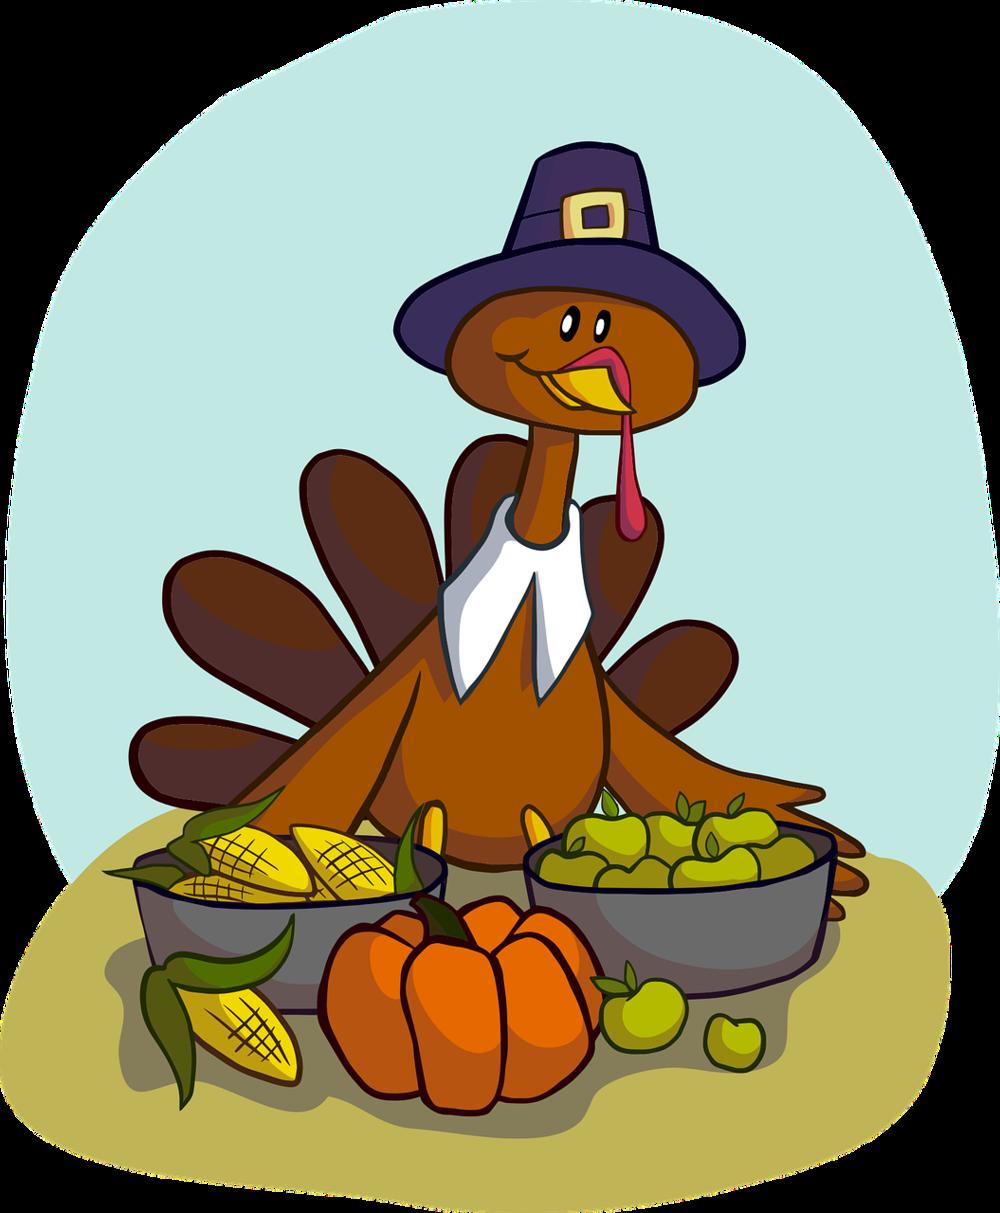 turkey-1456358_1280 (1).png